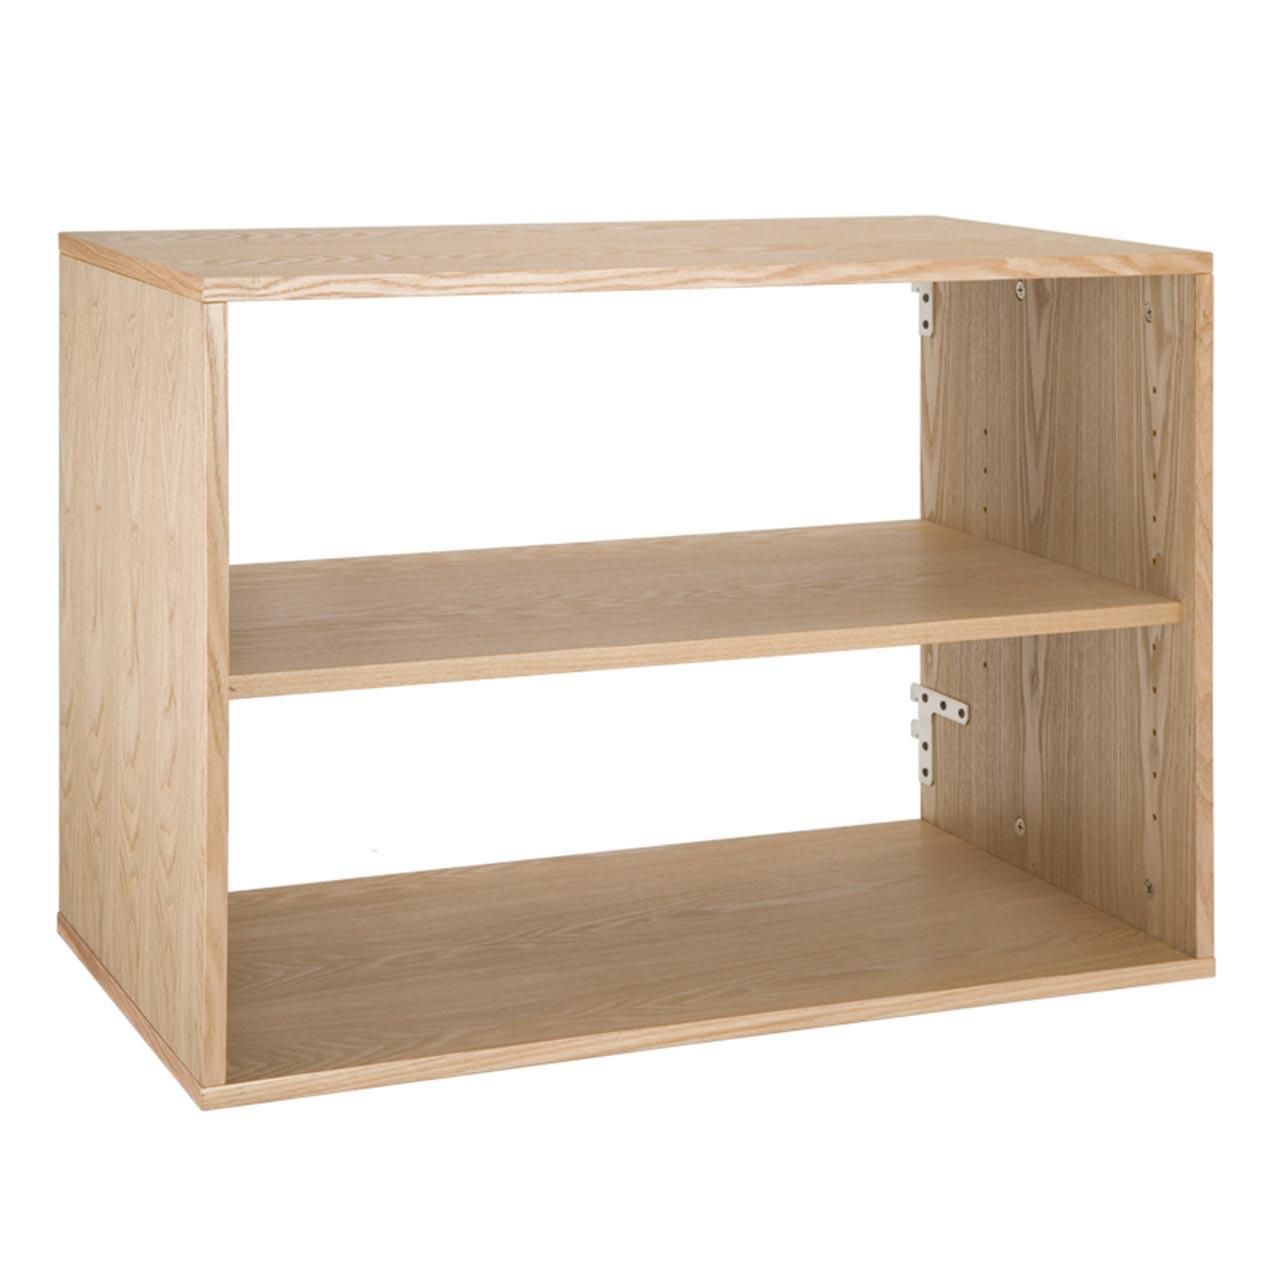 Big OBox Shelf Unit  - Light Oak